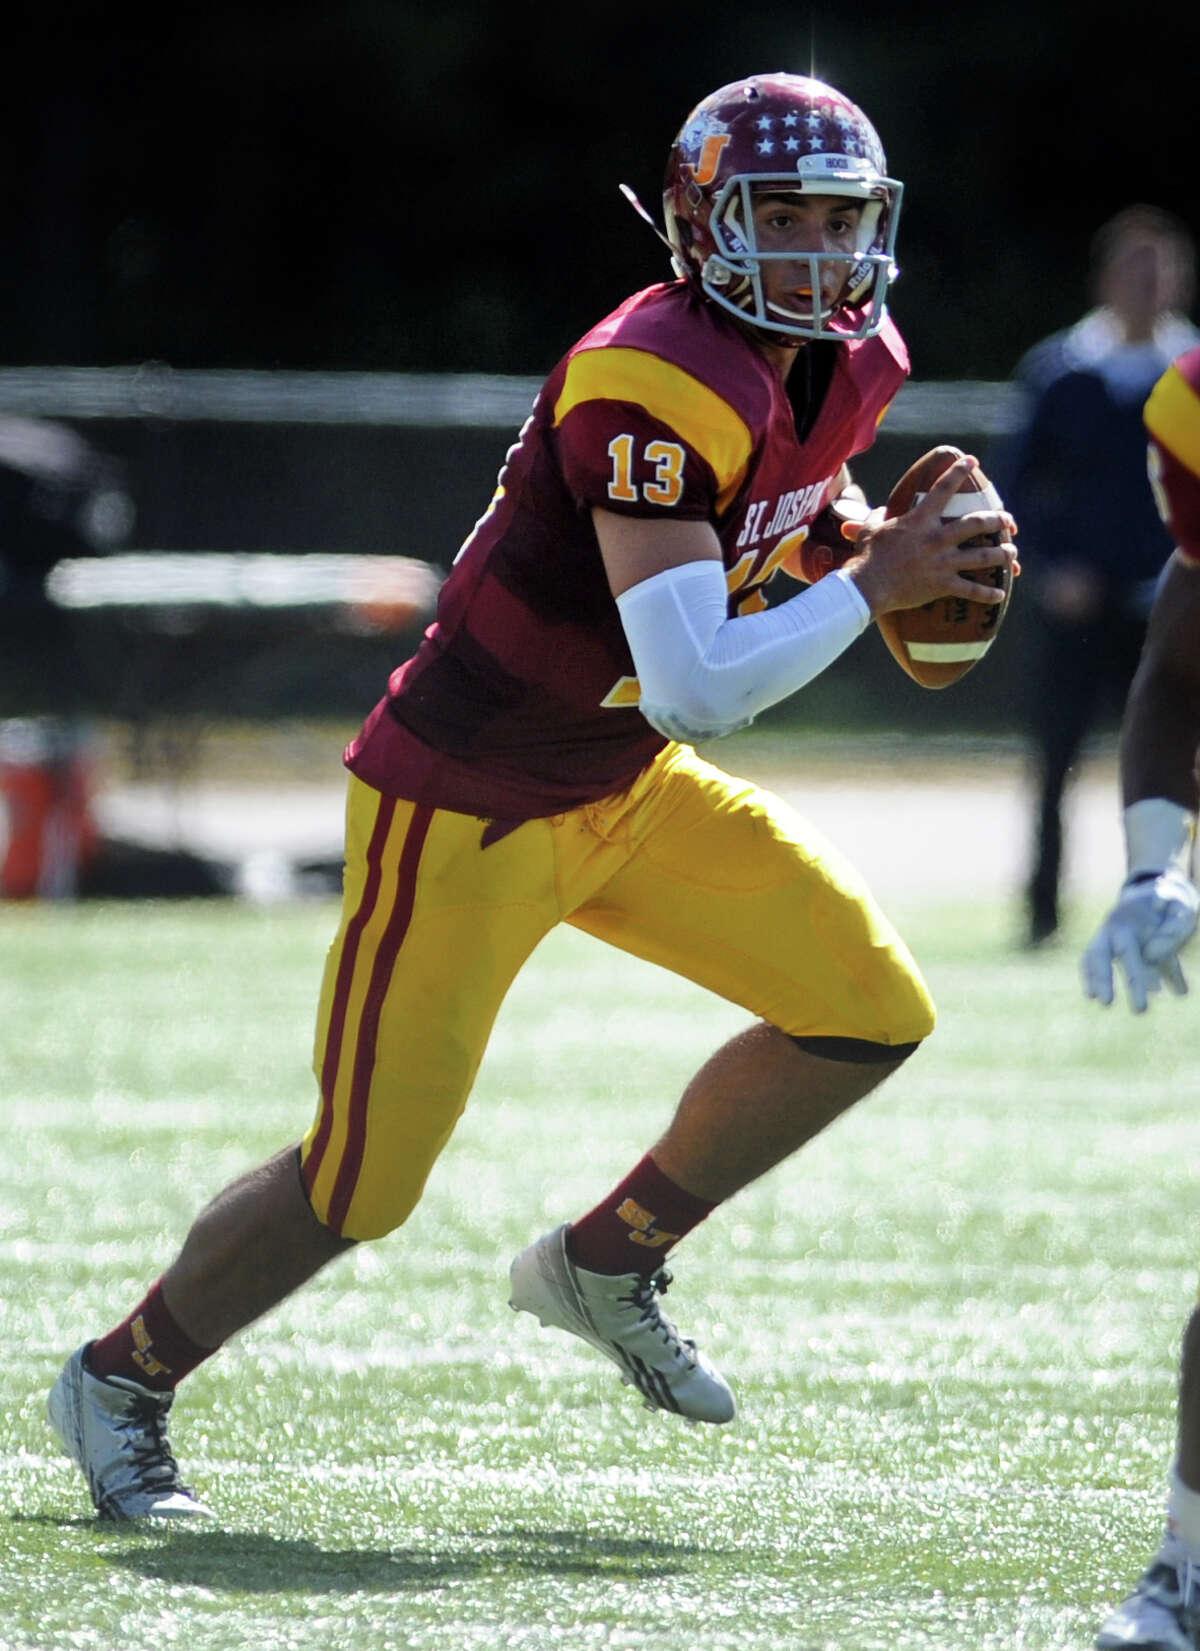 St.Joseph quarterback Jordan Vazzano looks to pass against Ridgefield Saturday, Sept. 28, 2013 at St. Joseph High School in Trumbull, Conn.